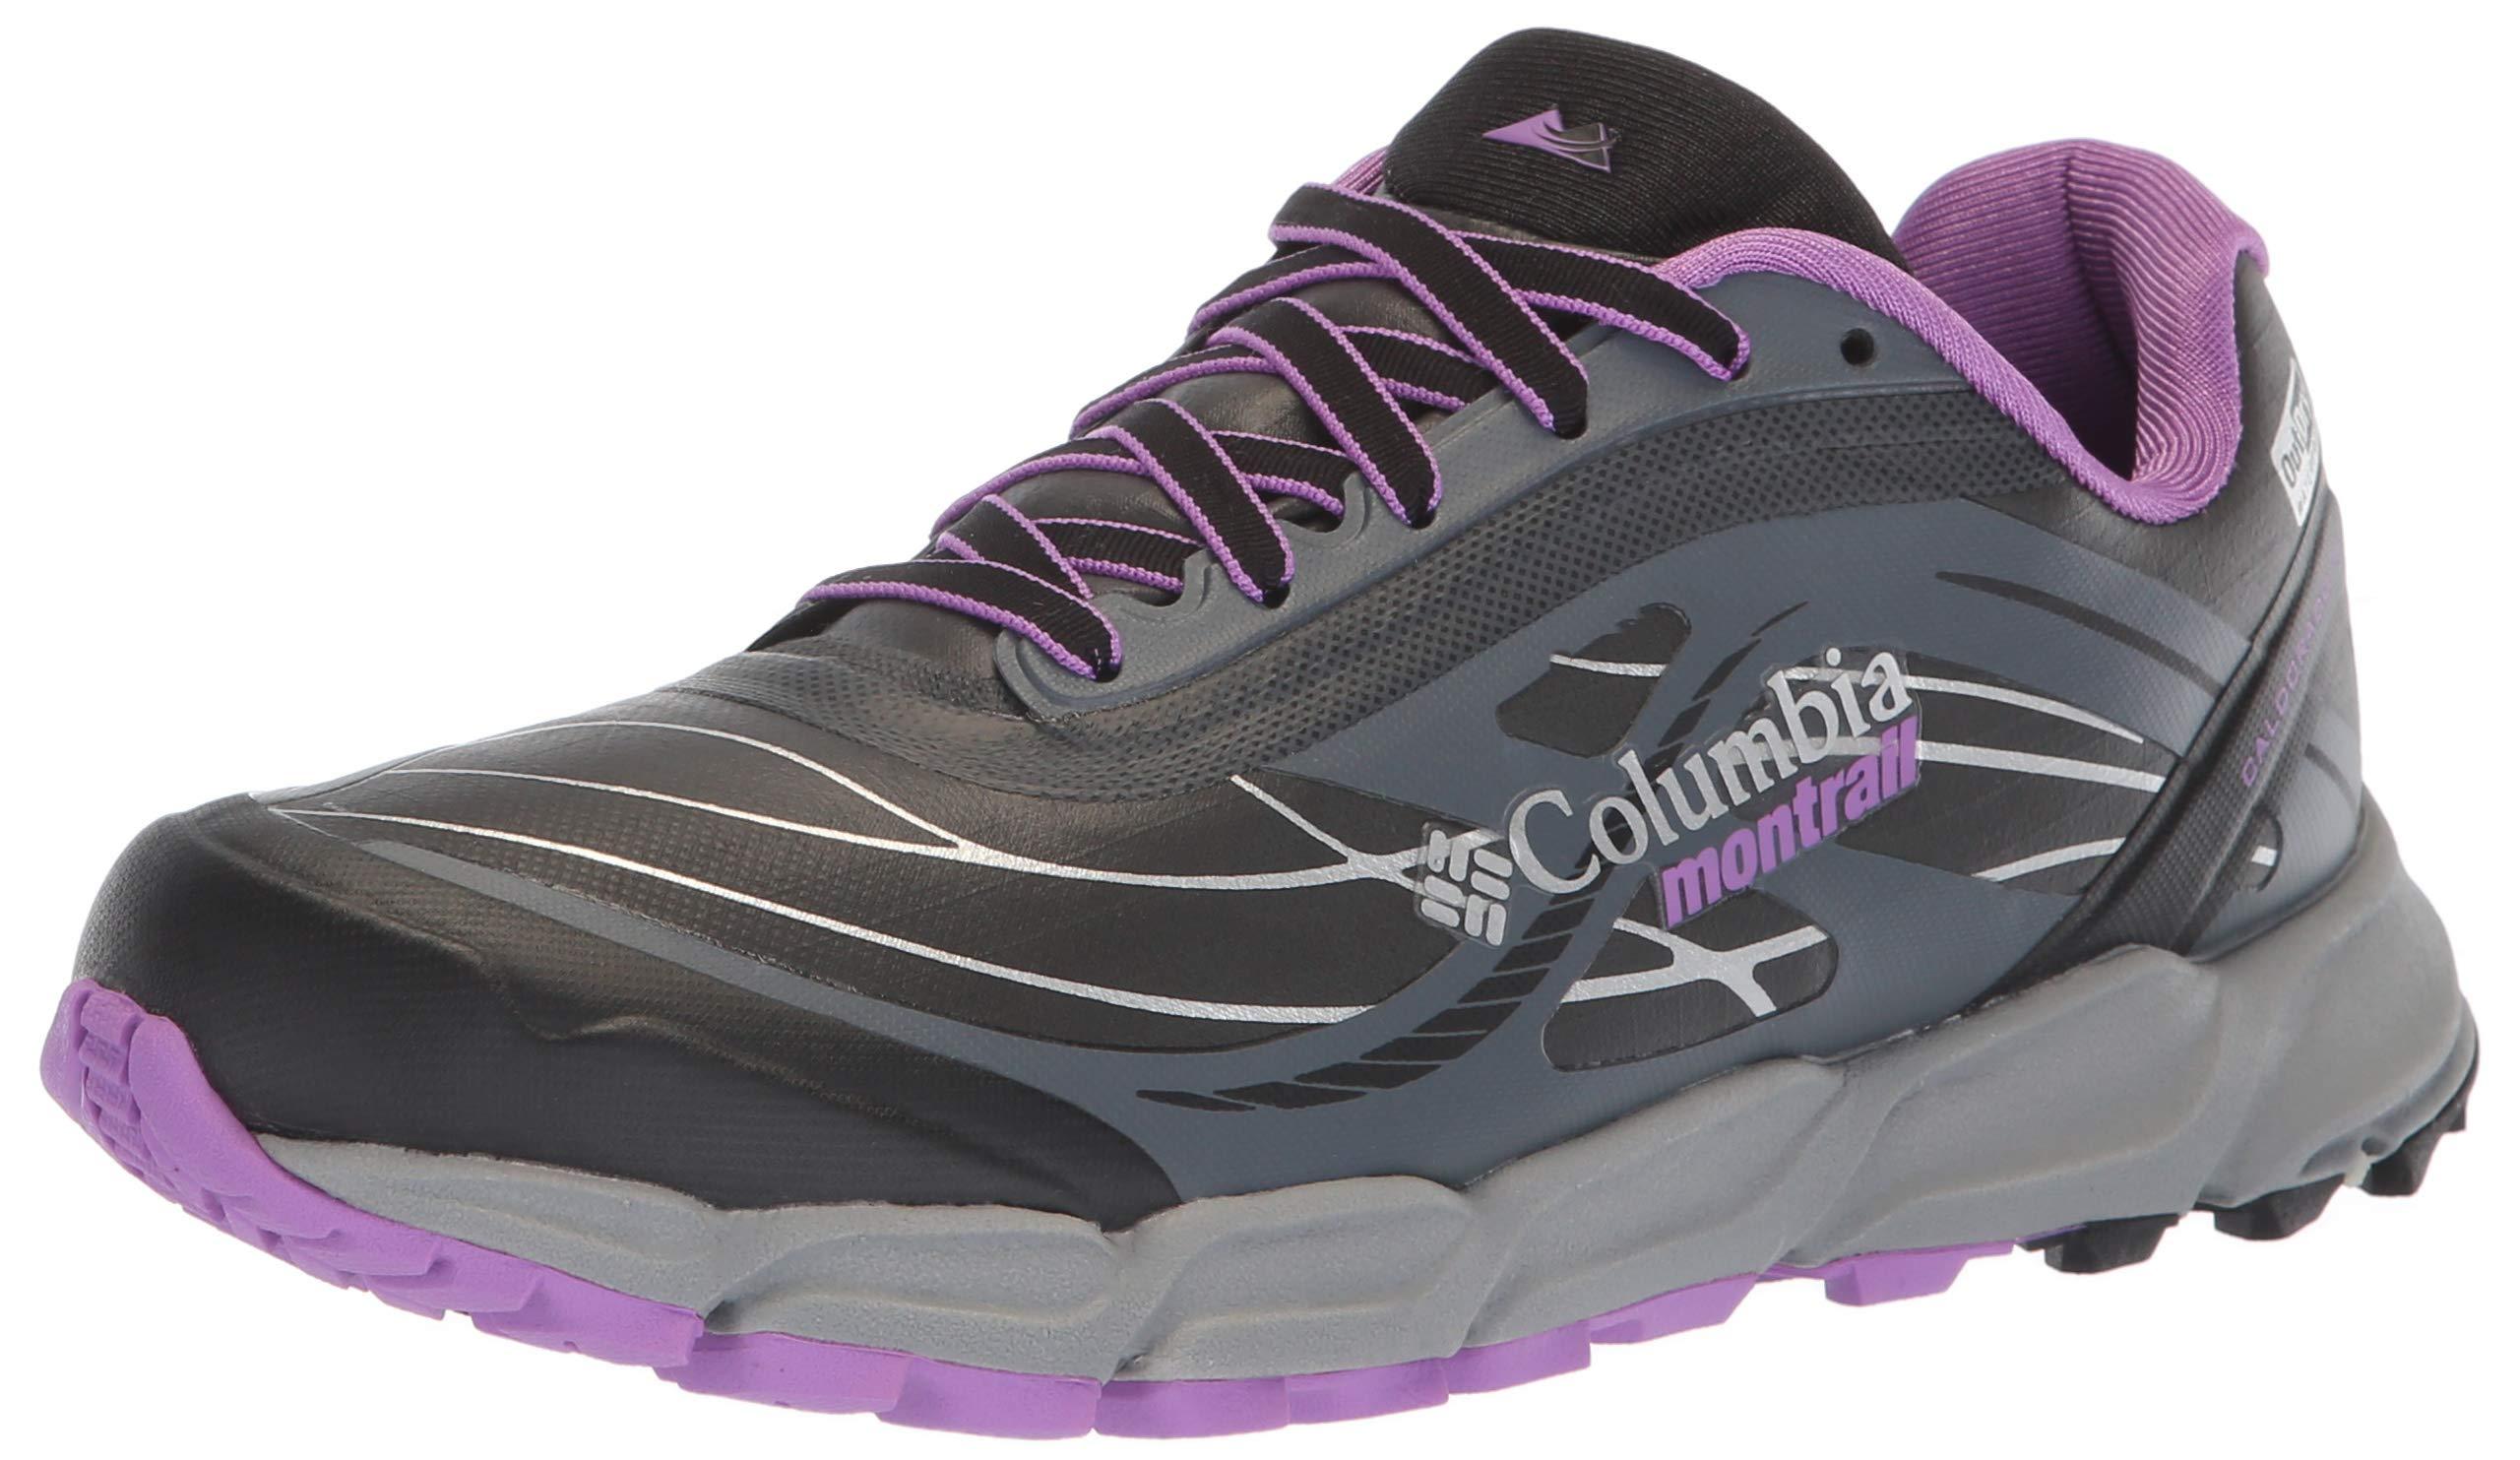 Columbia Women's CALDORADO III Outdry Extreme Hiking Shoe, Black, Crown Jewel, 10.5 Regular US by Columbia